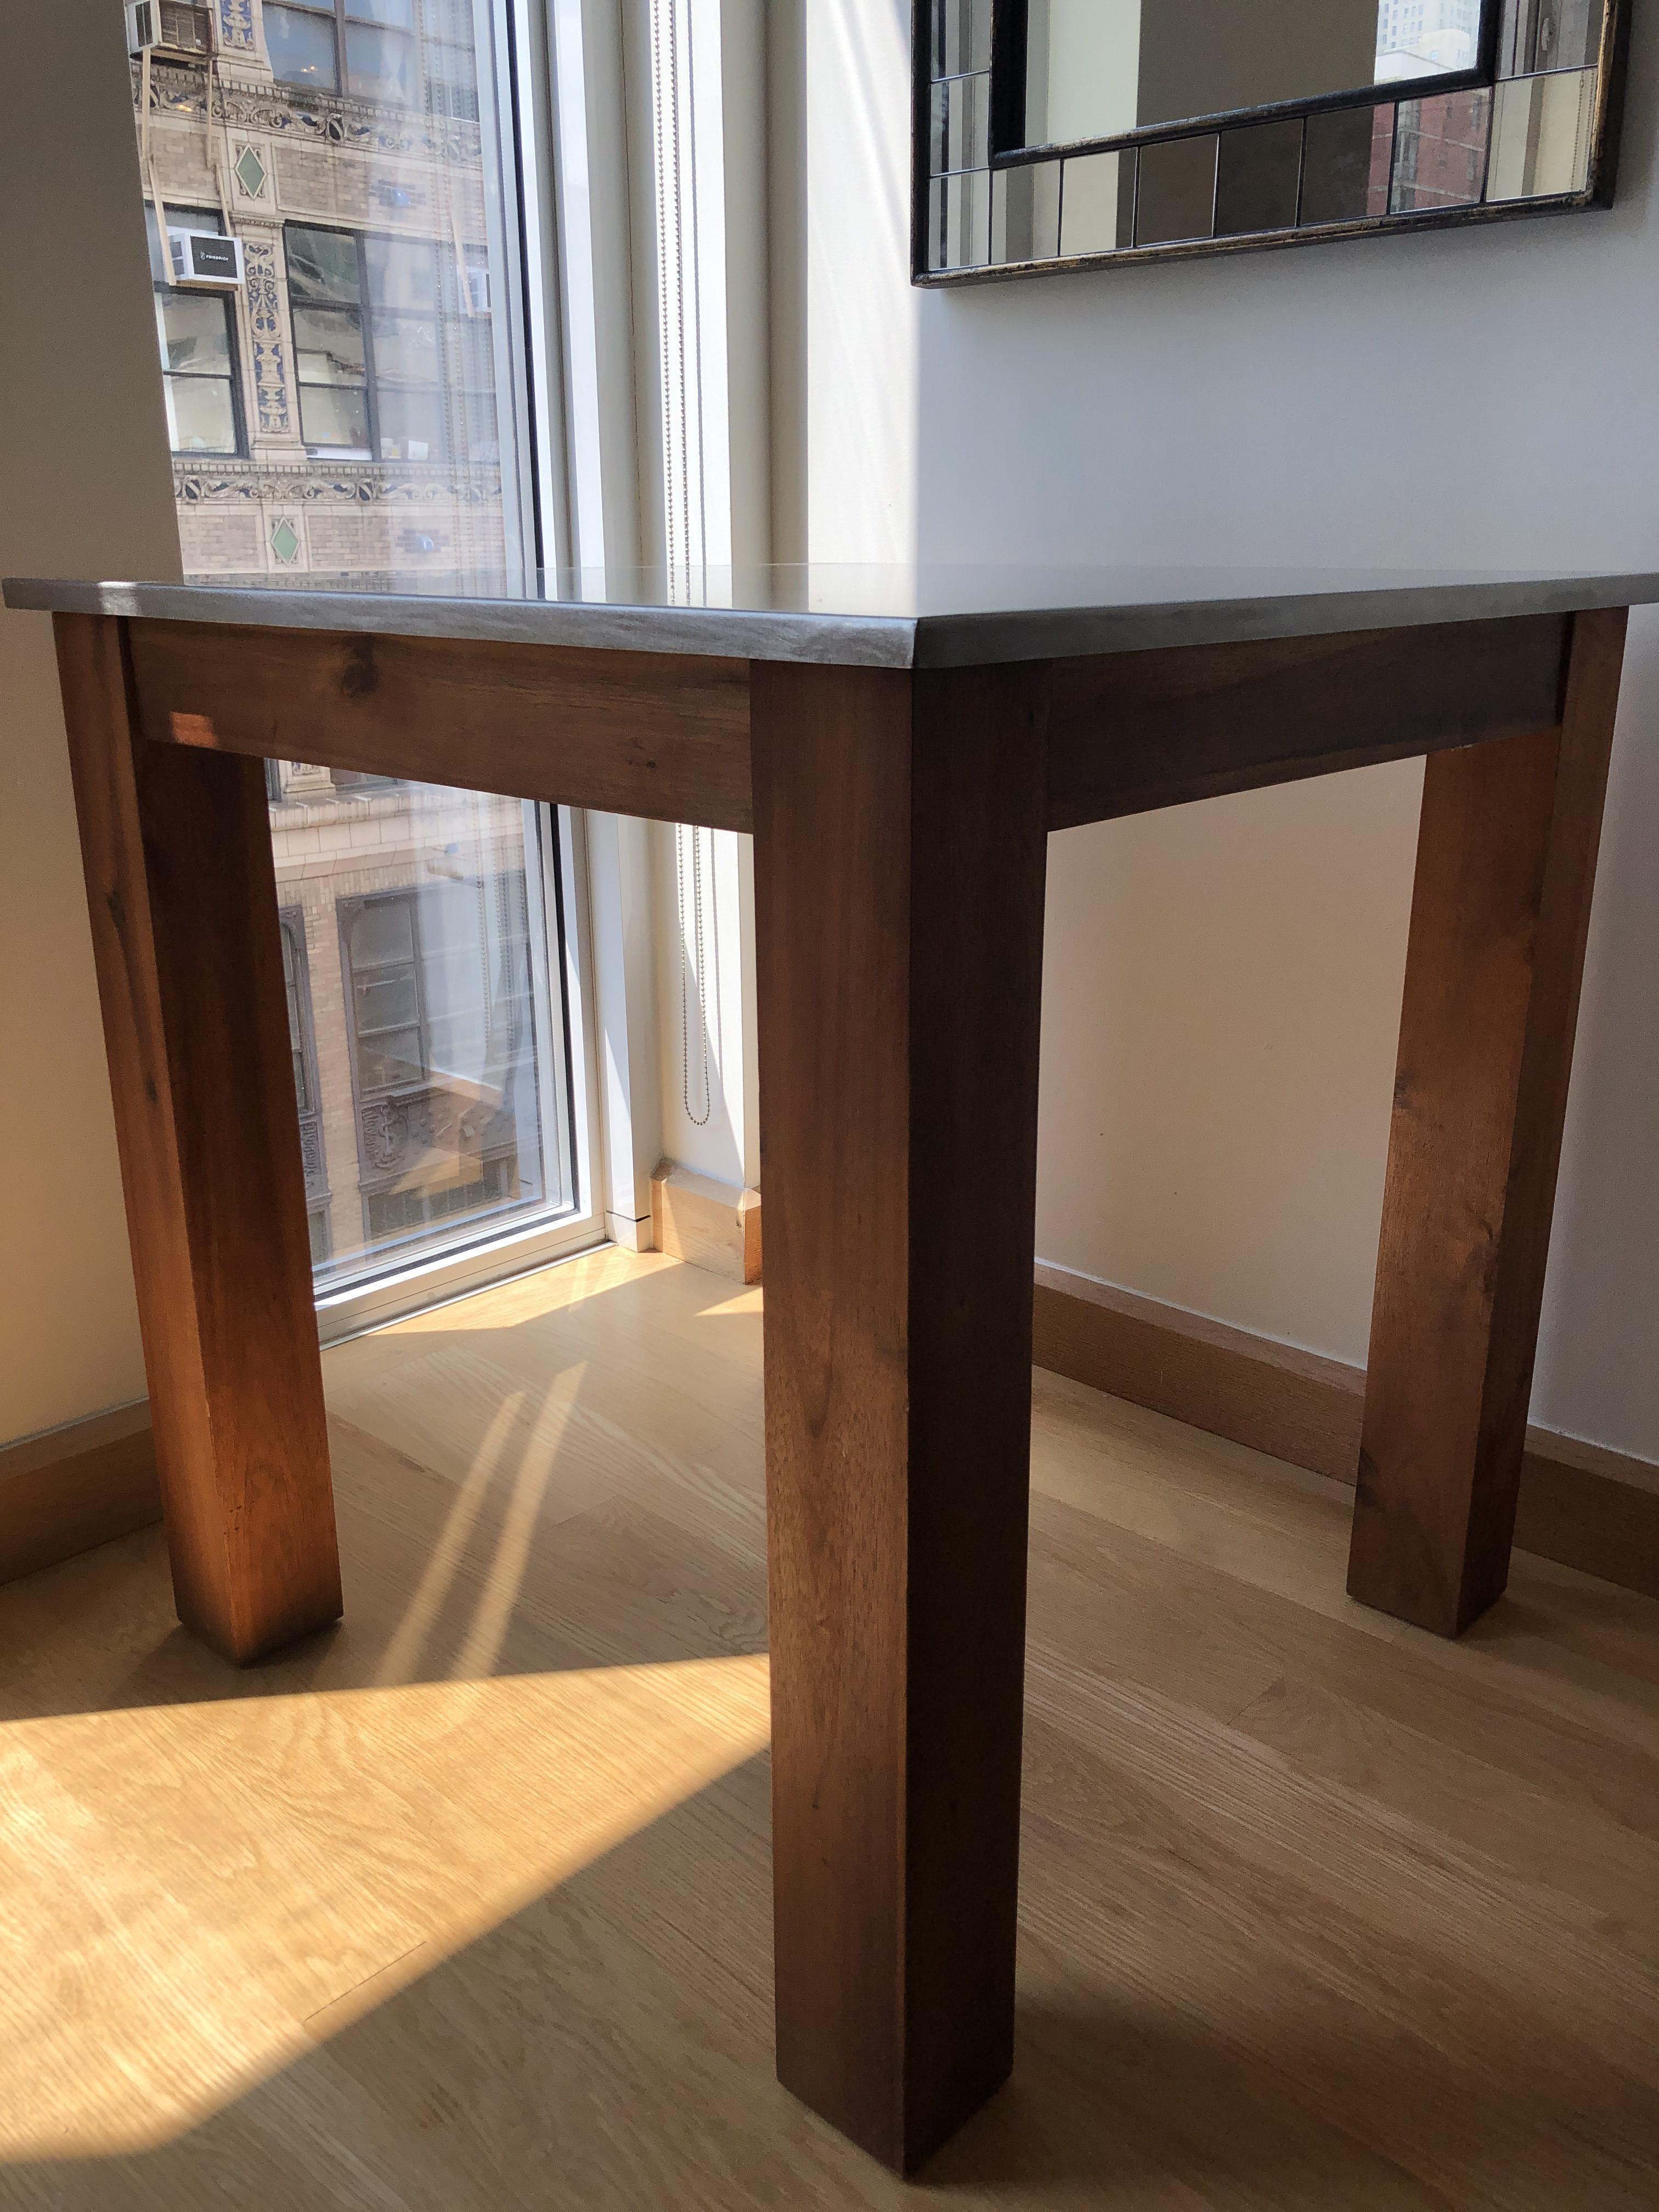 West Elm Wood/Metal Kitchen Table - AptDeco